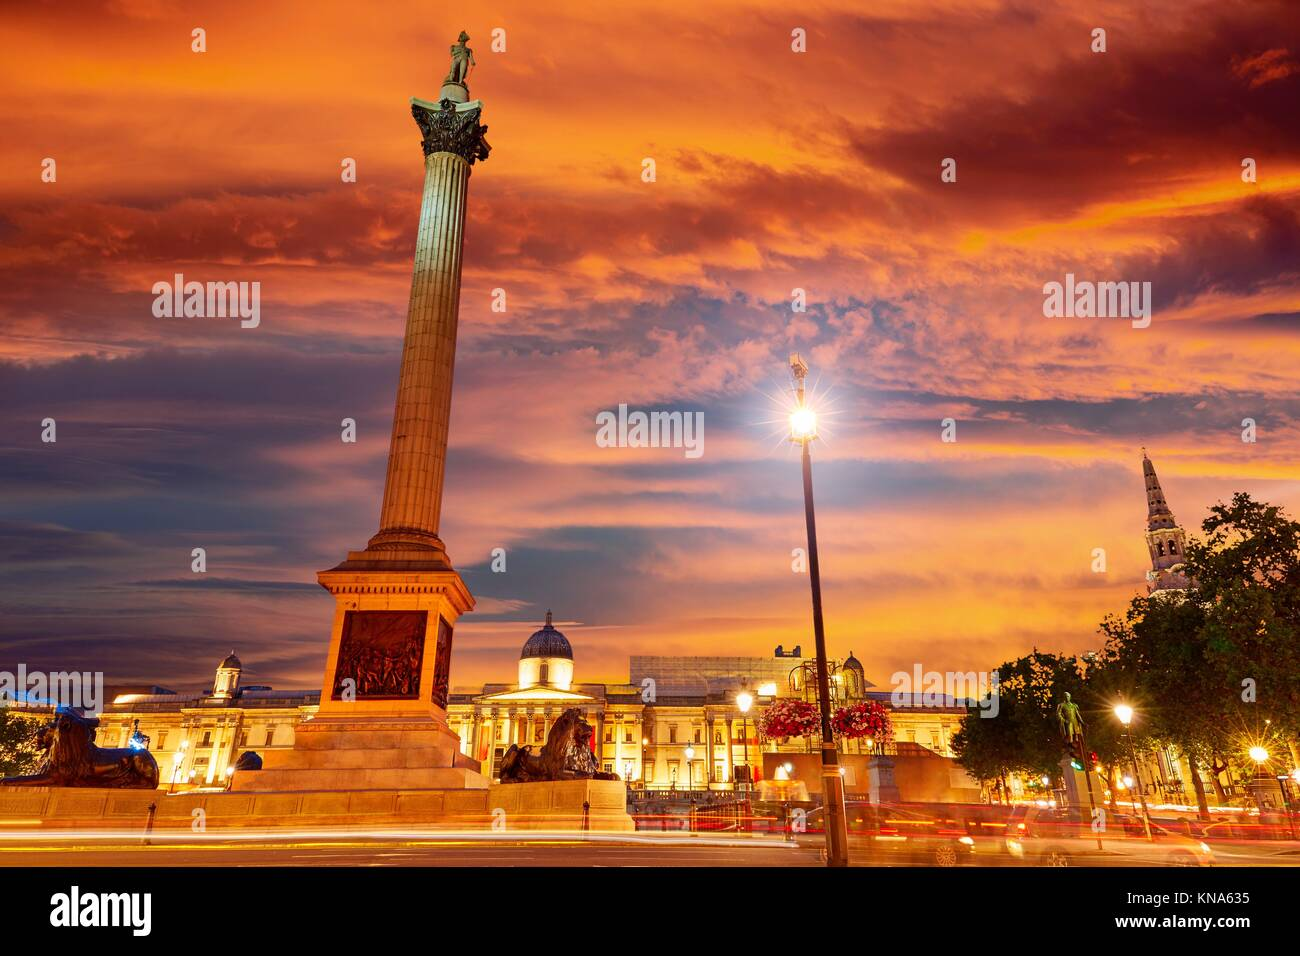 London Trafalgar Square sunset Nelson column in England. Stock Photo